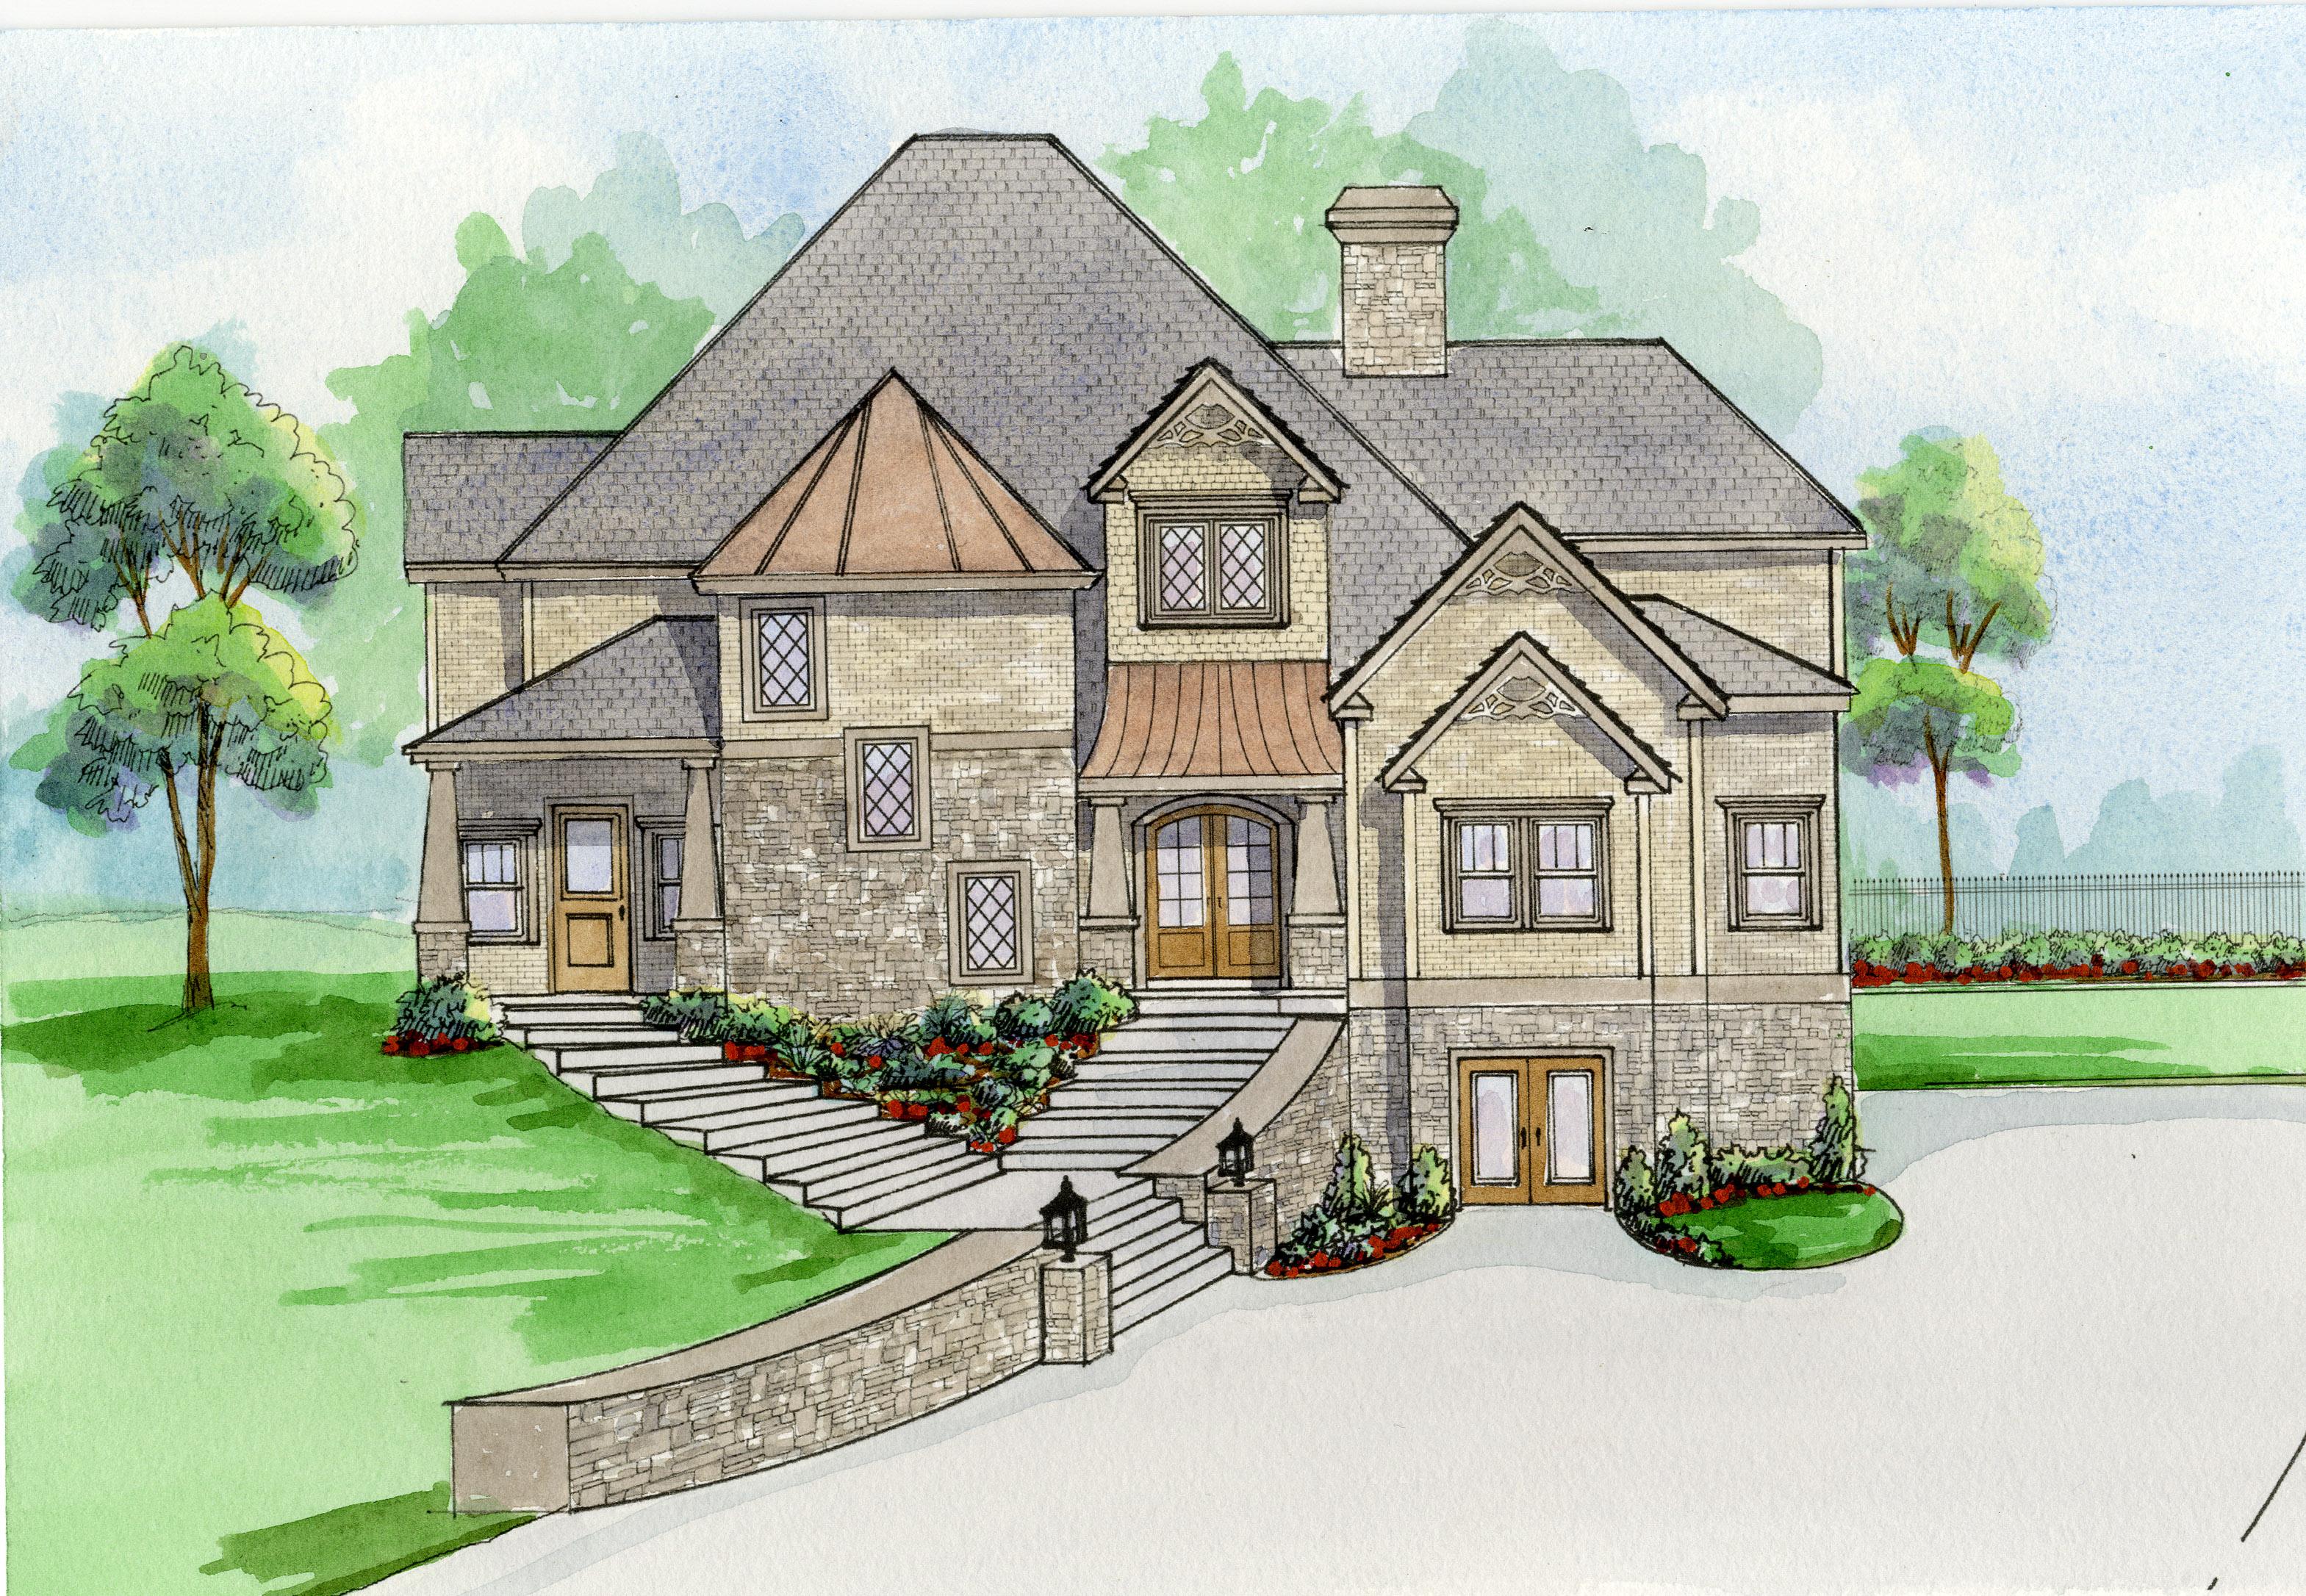 Single Family Home for Sale at New Construction In Buckhead 3037 Towerview Drive NE Buckhead, Atlanta, Georgia 30324 United States